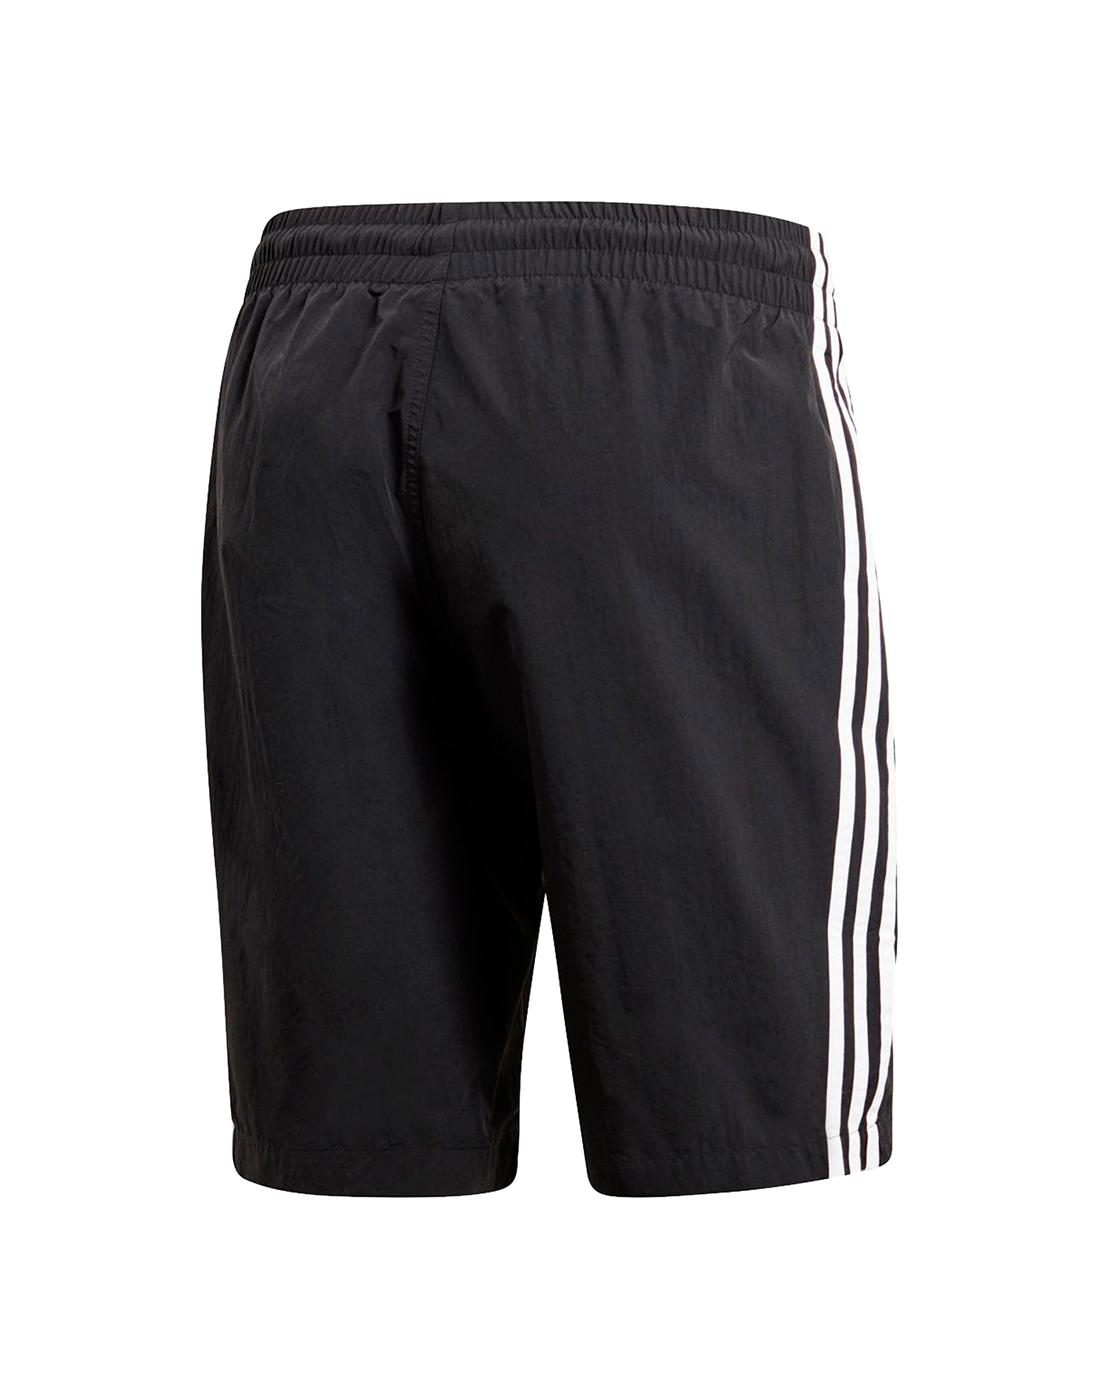 3013019513 adidas Originals. Mens 3-Stripes Short. Mens 3-Stripes Short · Mens 3-Stripes  Short